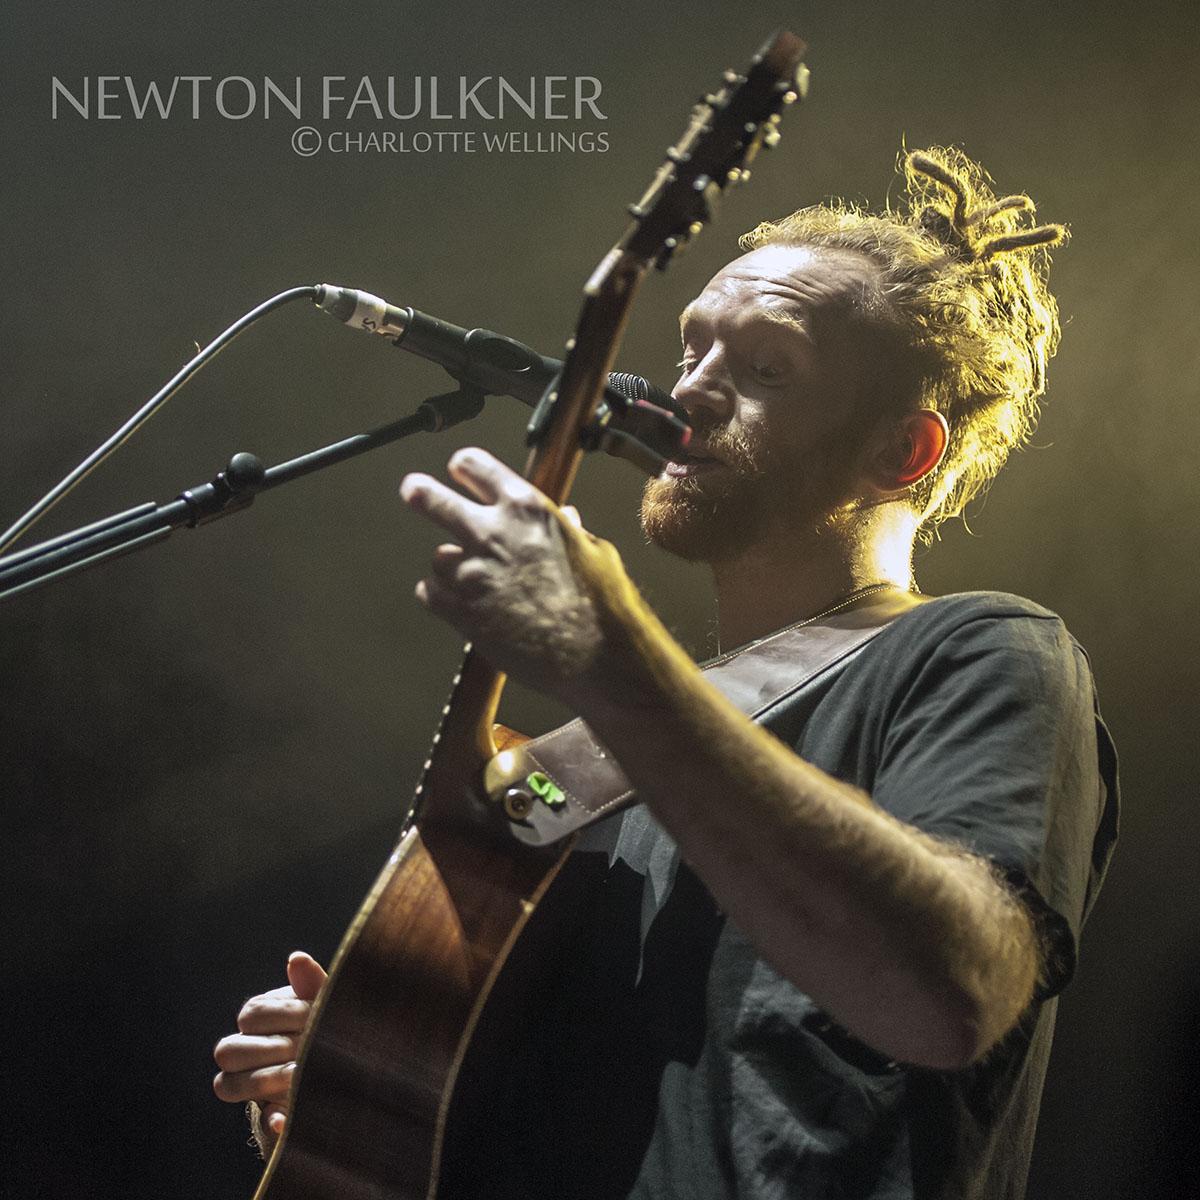 Newton Faulkner01WM